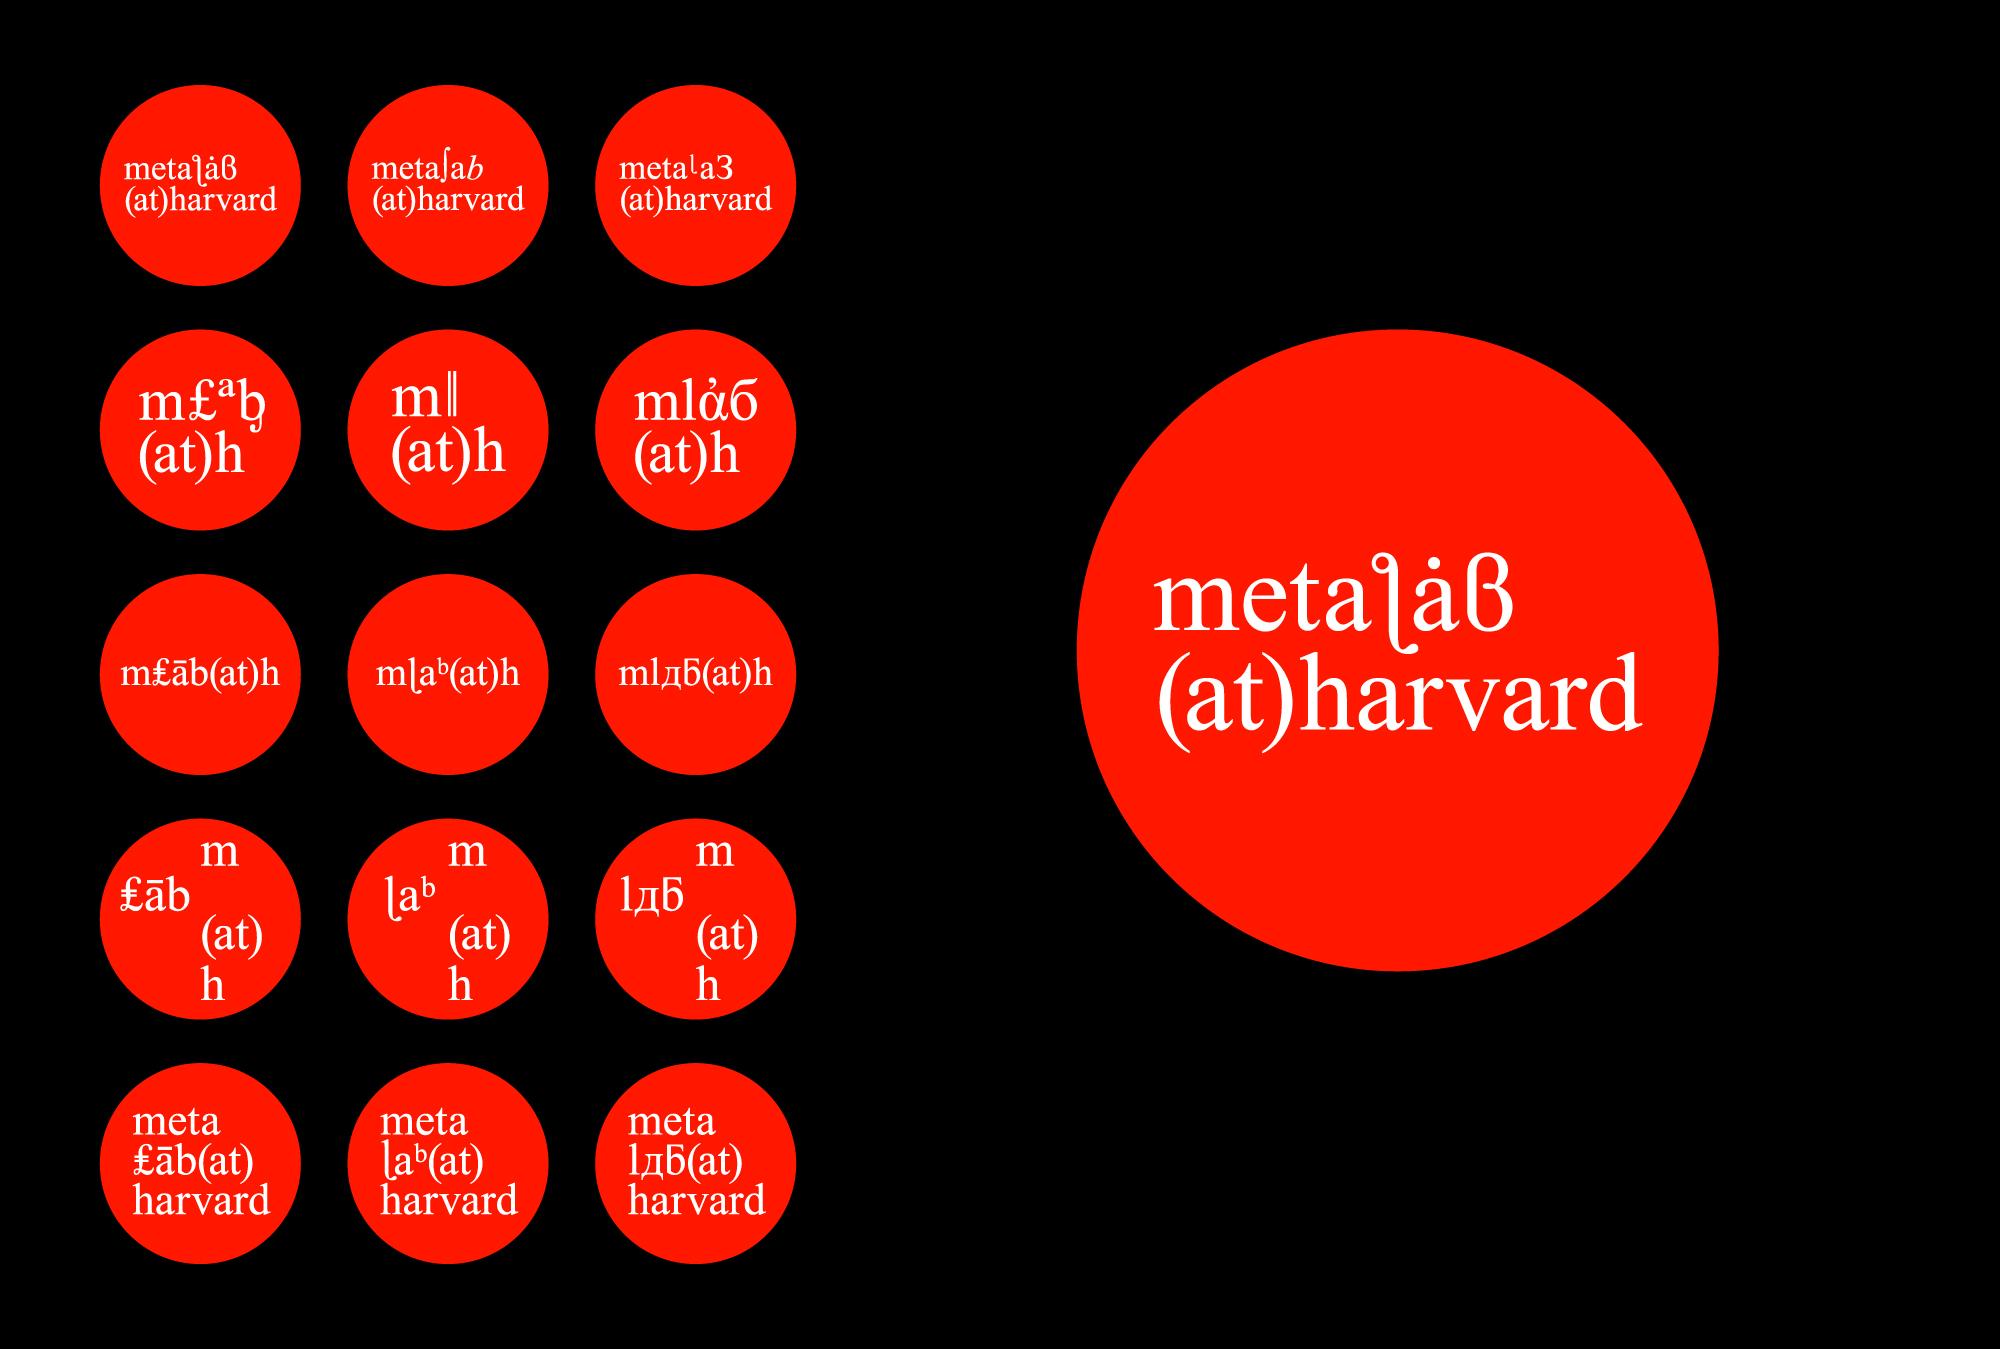 2016_MetaLabProject_VisualIdentity